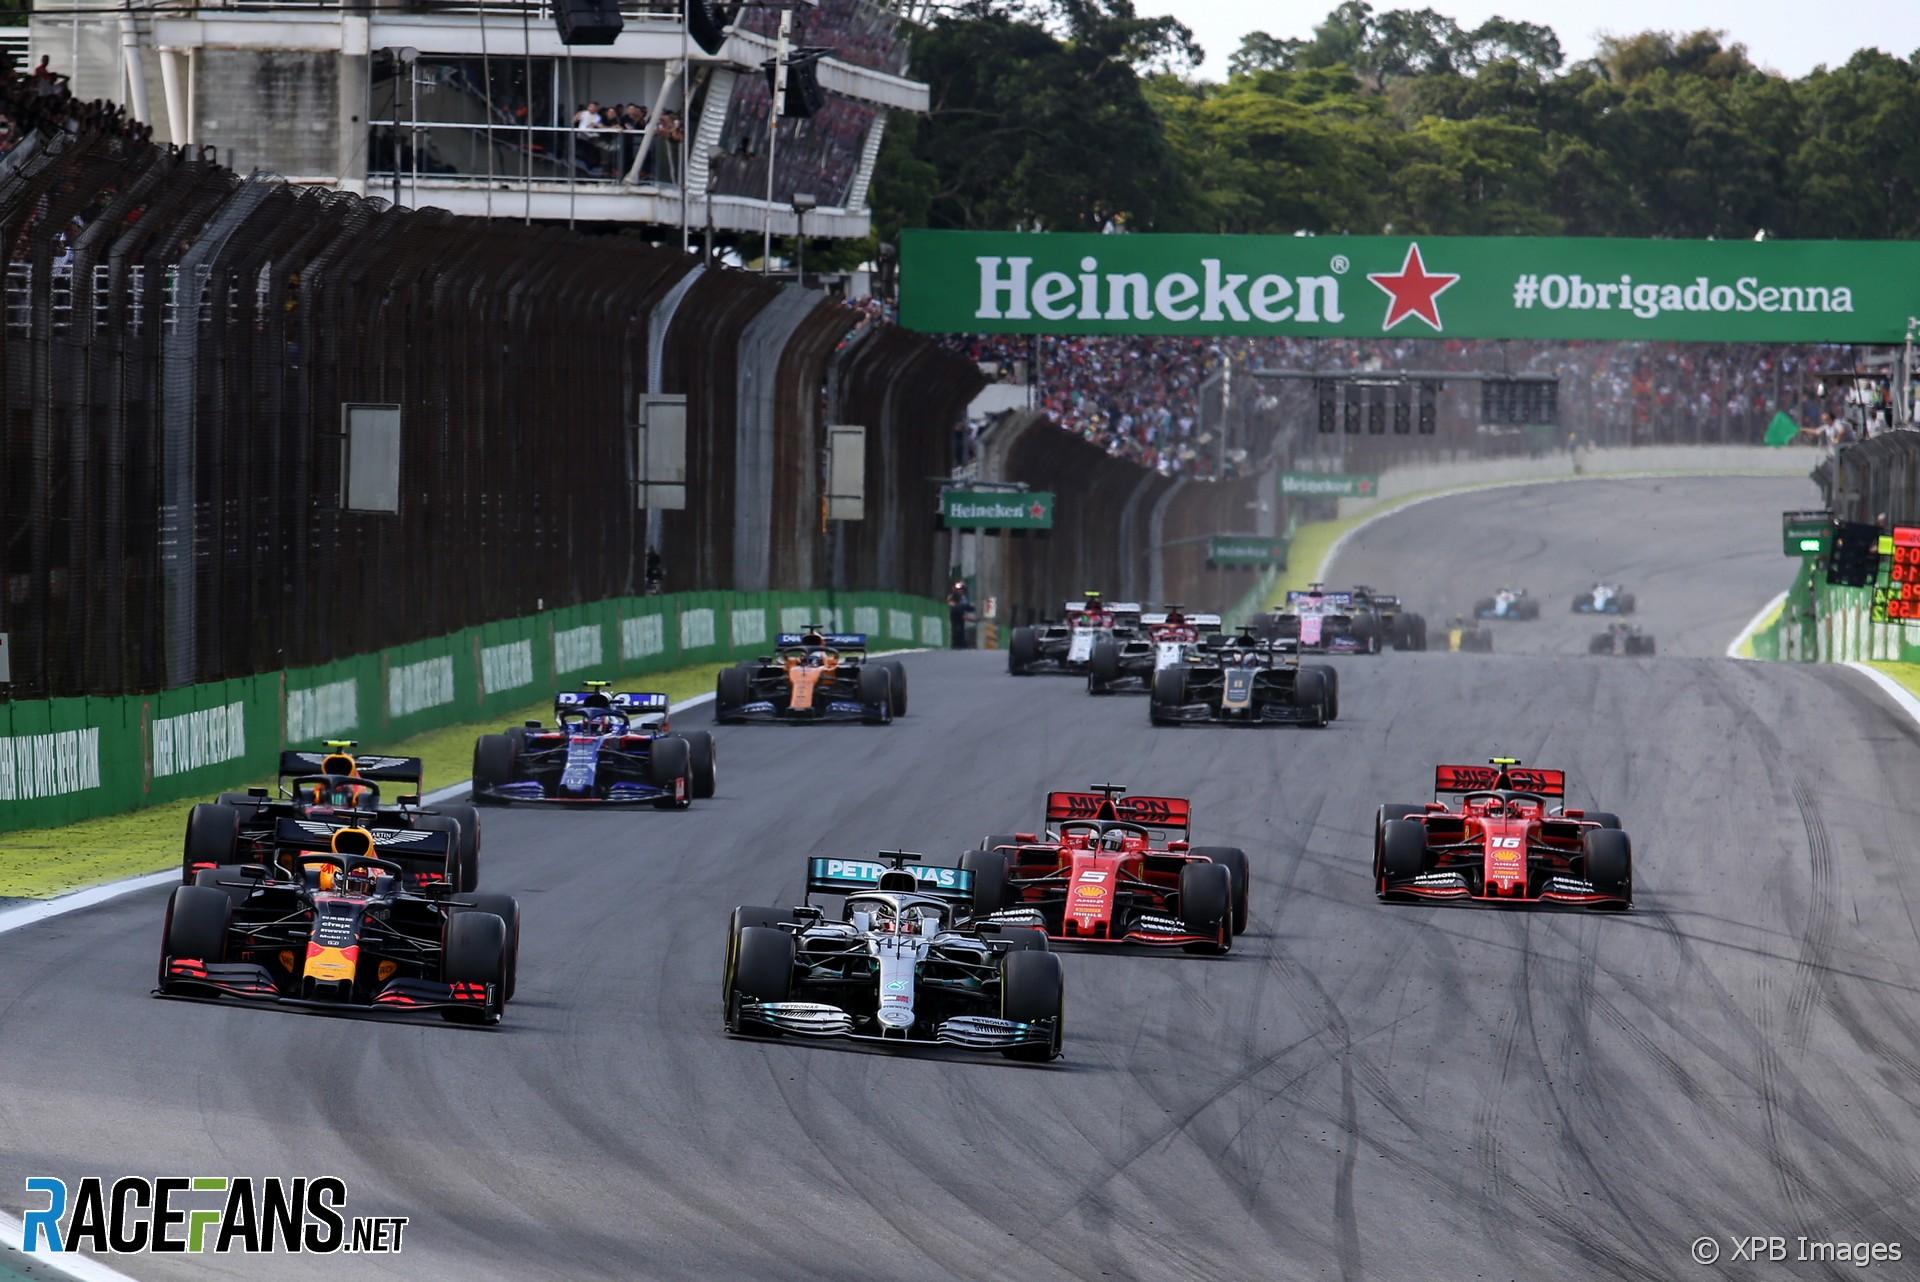 Start, Interlagos, 2019